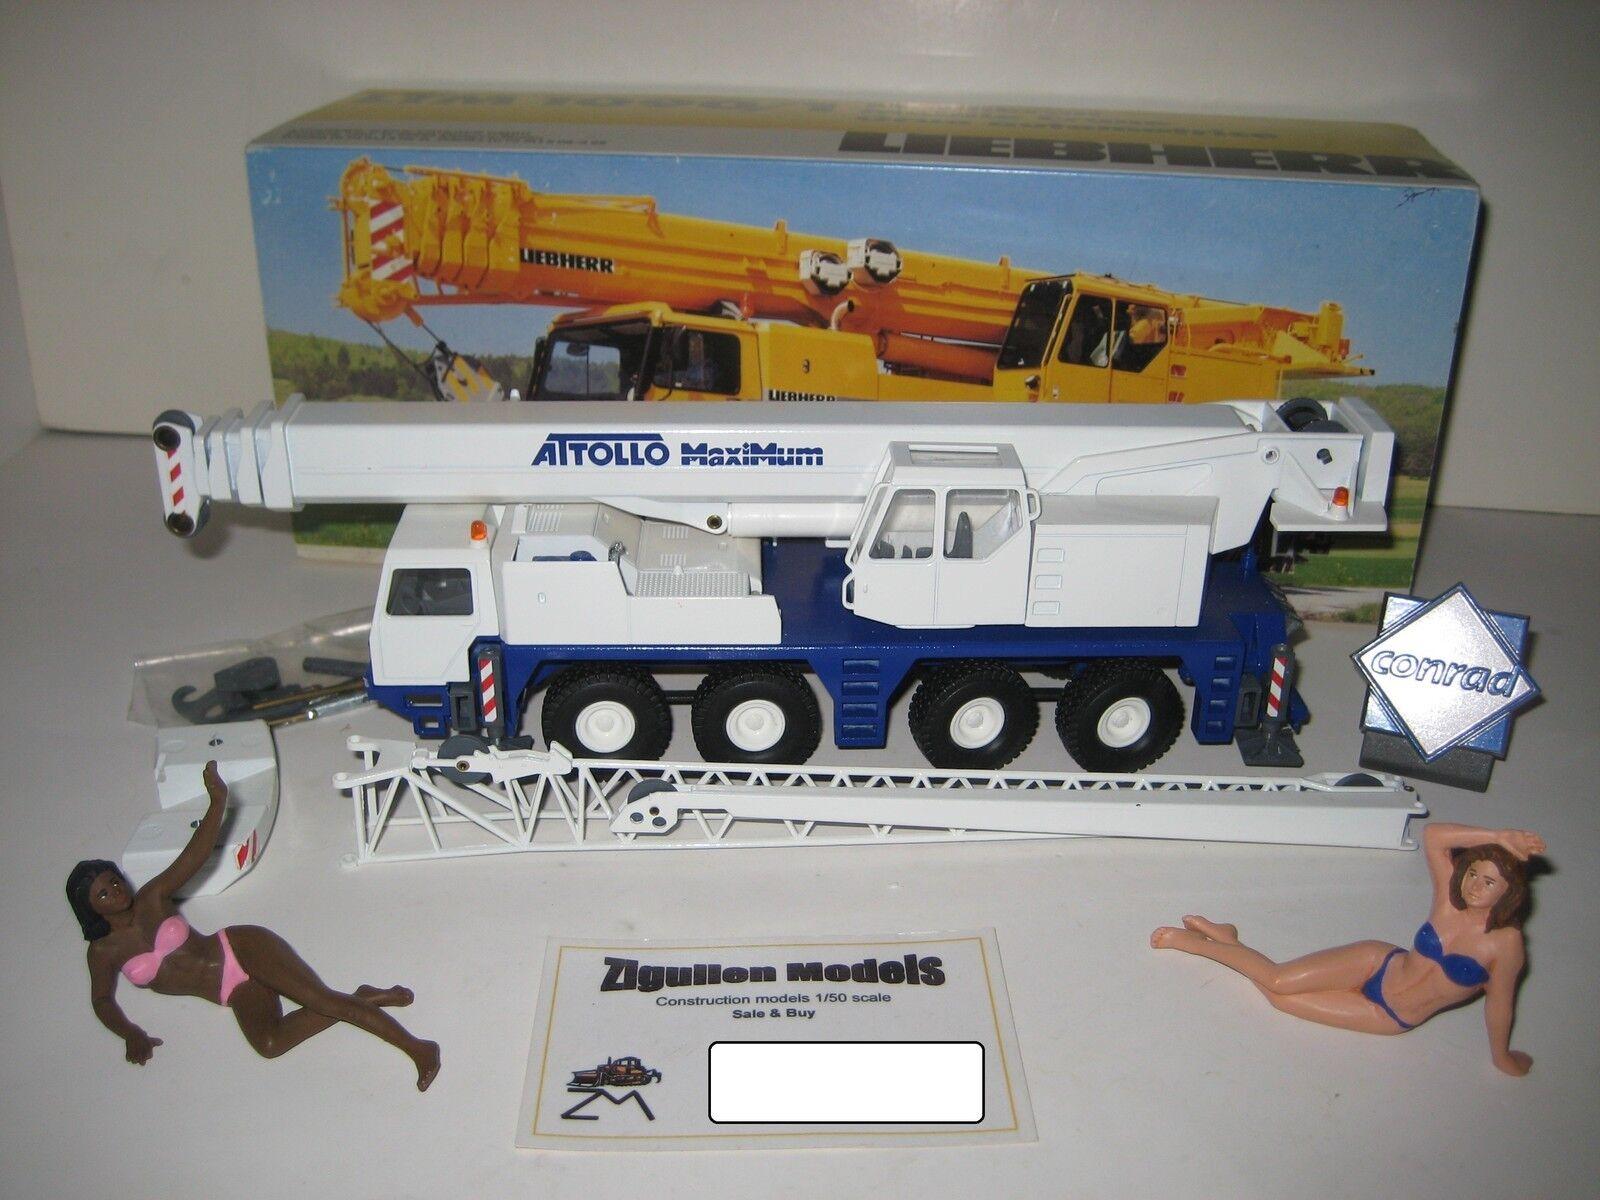 Liebherr LTM 1090-1 Autokran attollo maximum  2087.20 CONRAD 1 50 NEUF dans sa boîte